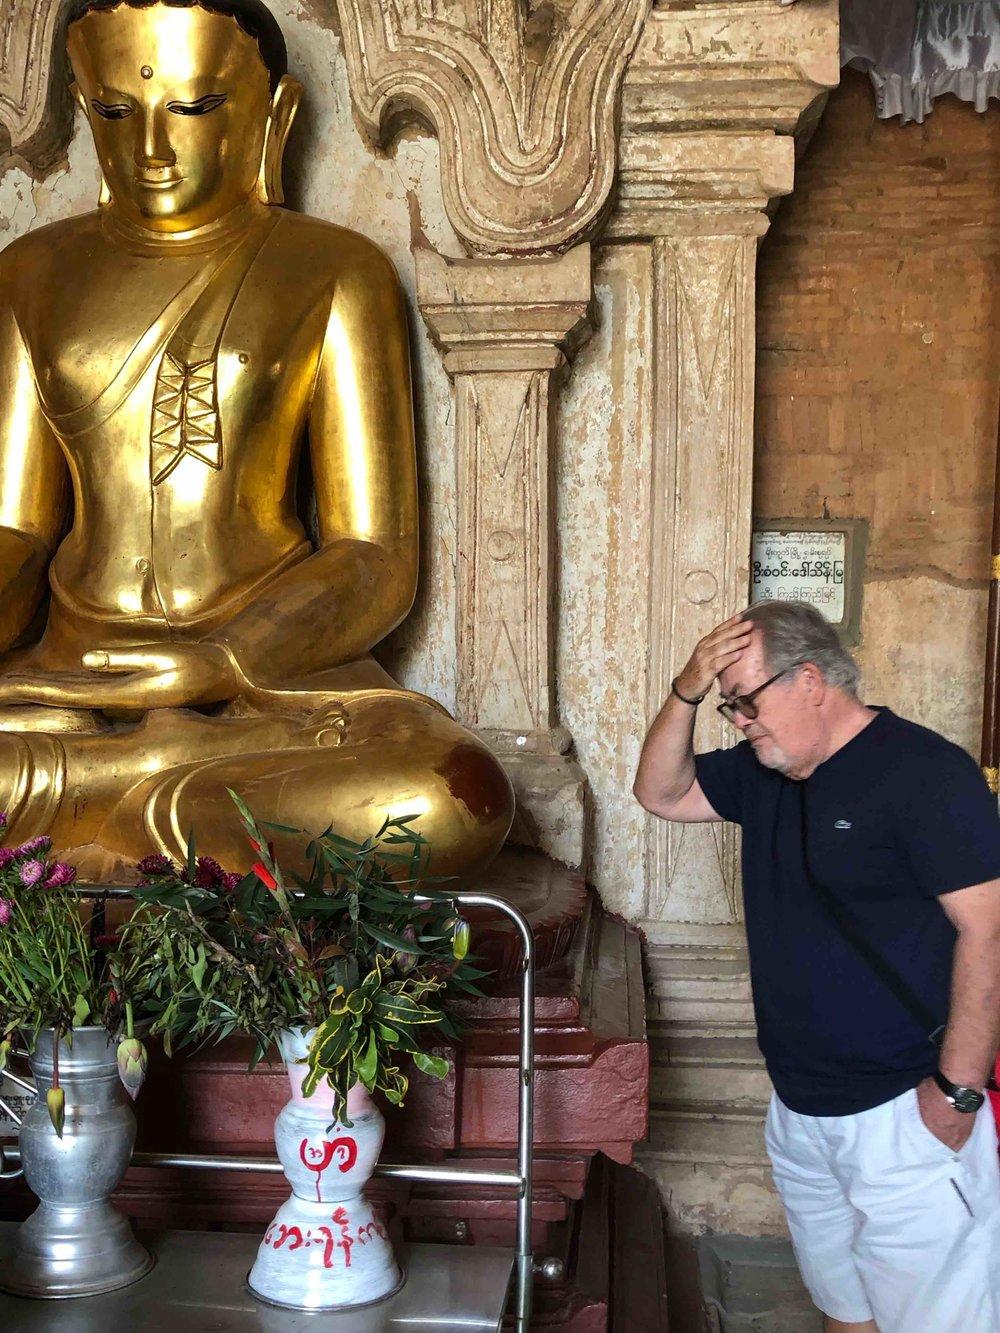 Rubbing Buddha for good luck